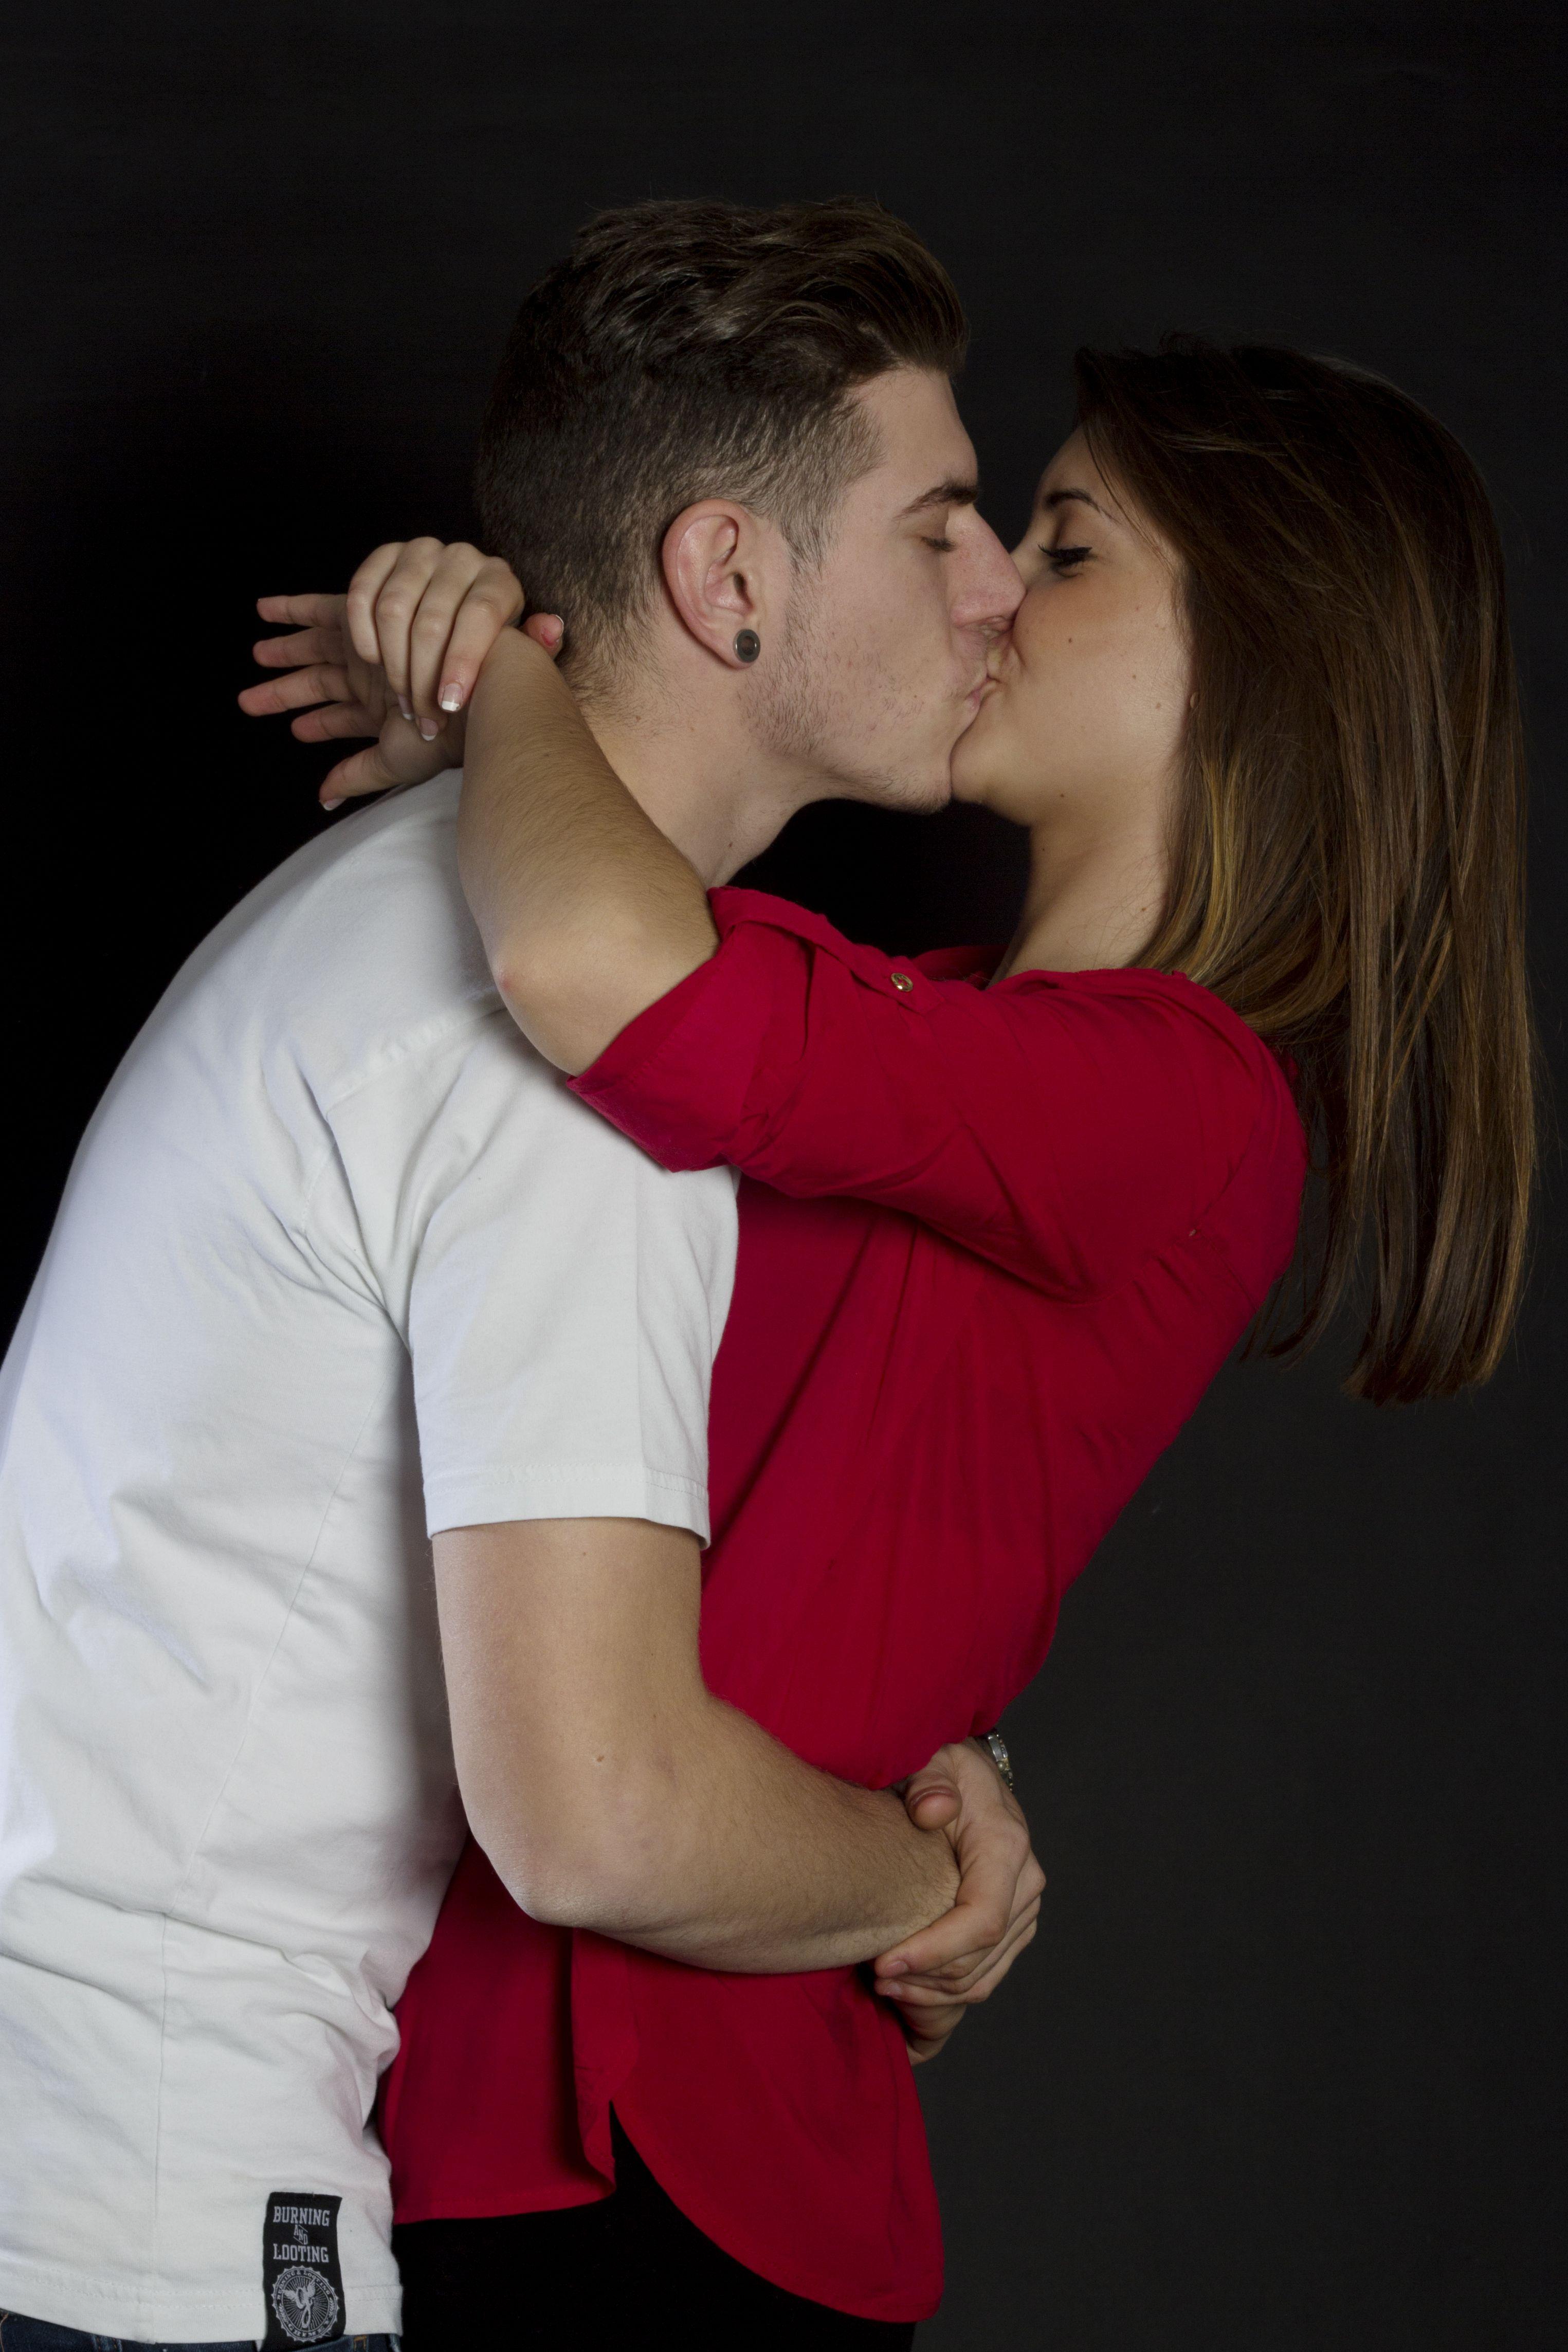 Lot of kisses. #sesióndepareja #SanValentin #fotografía #amor